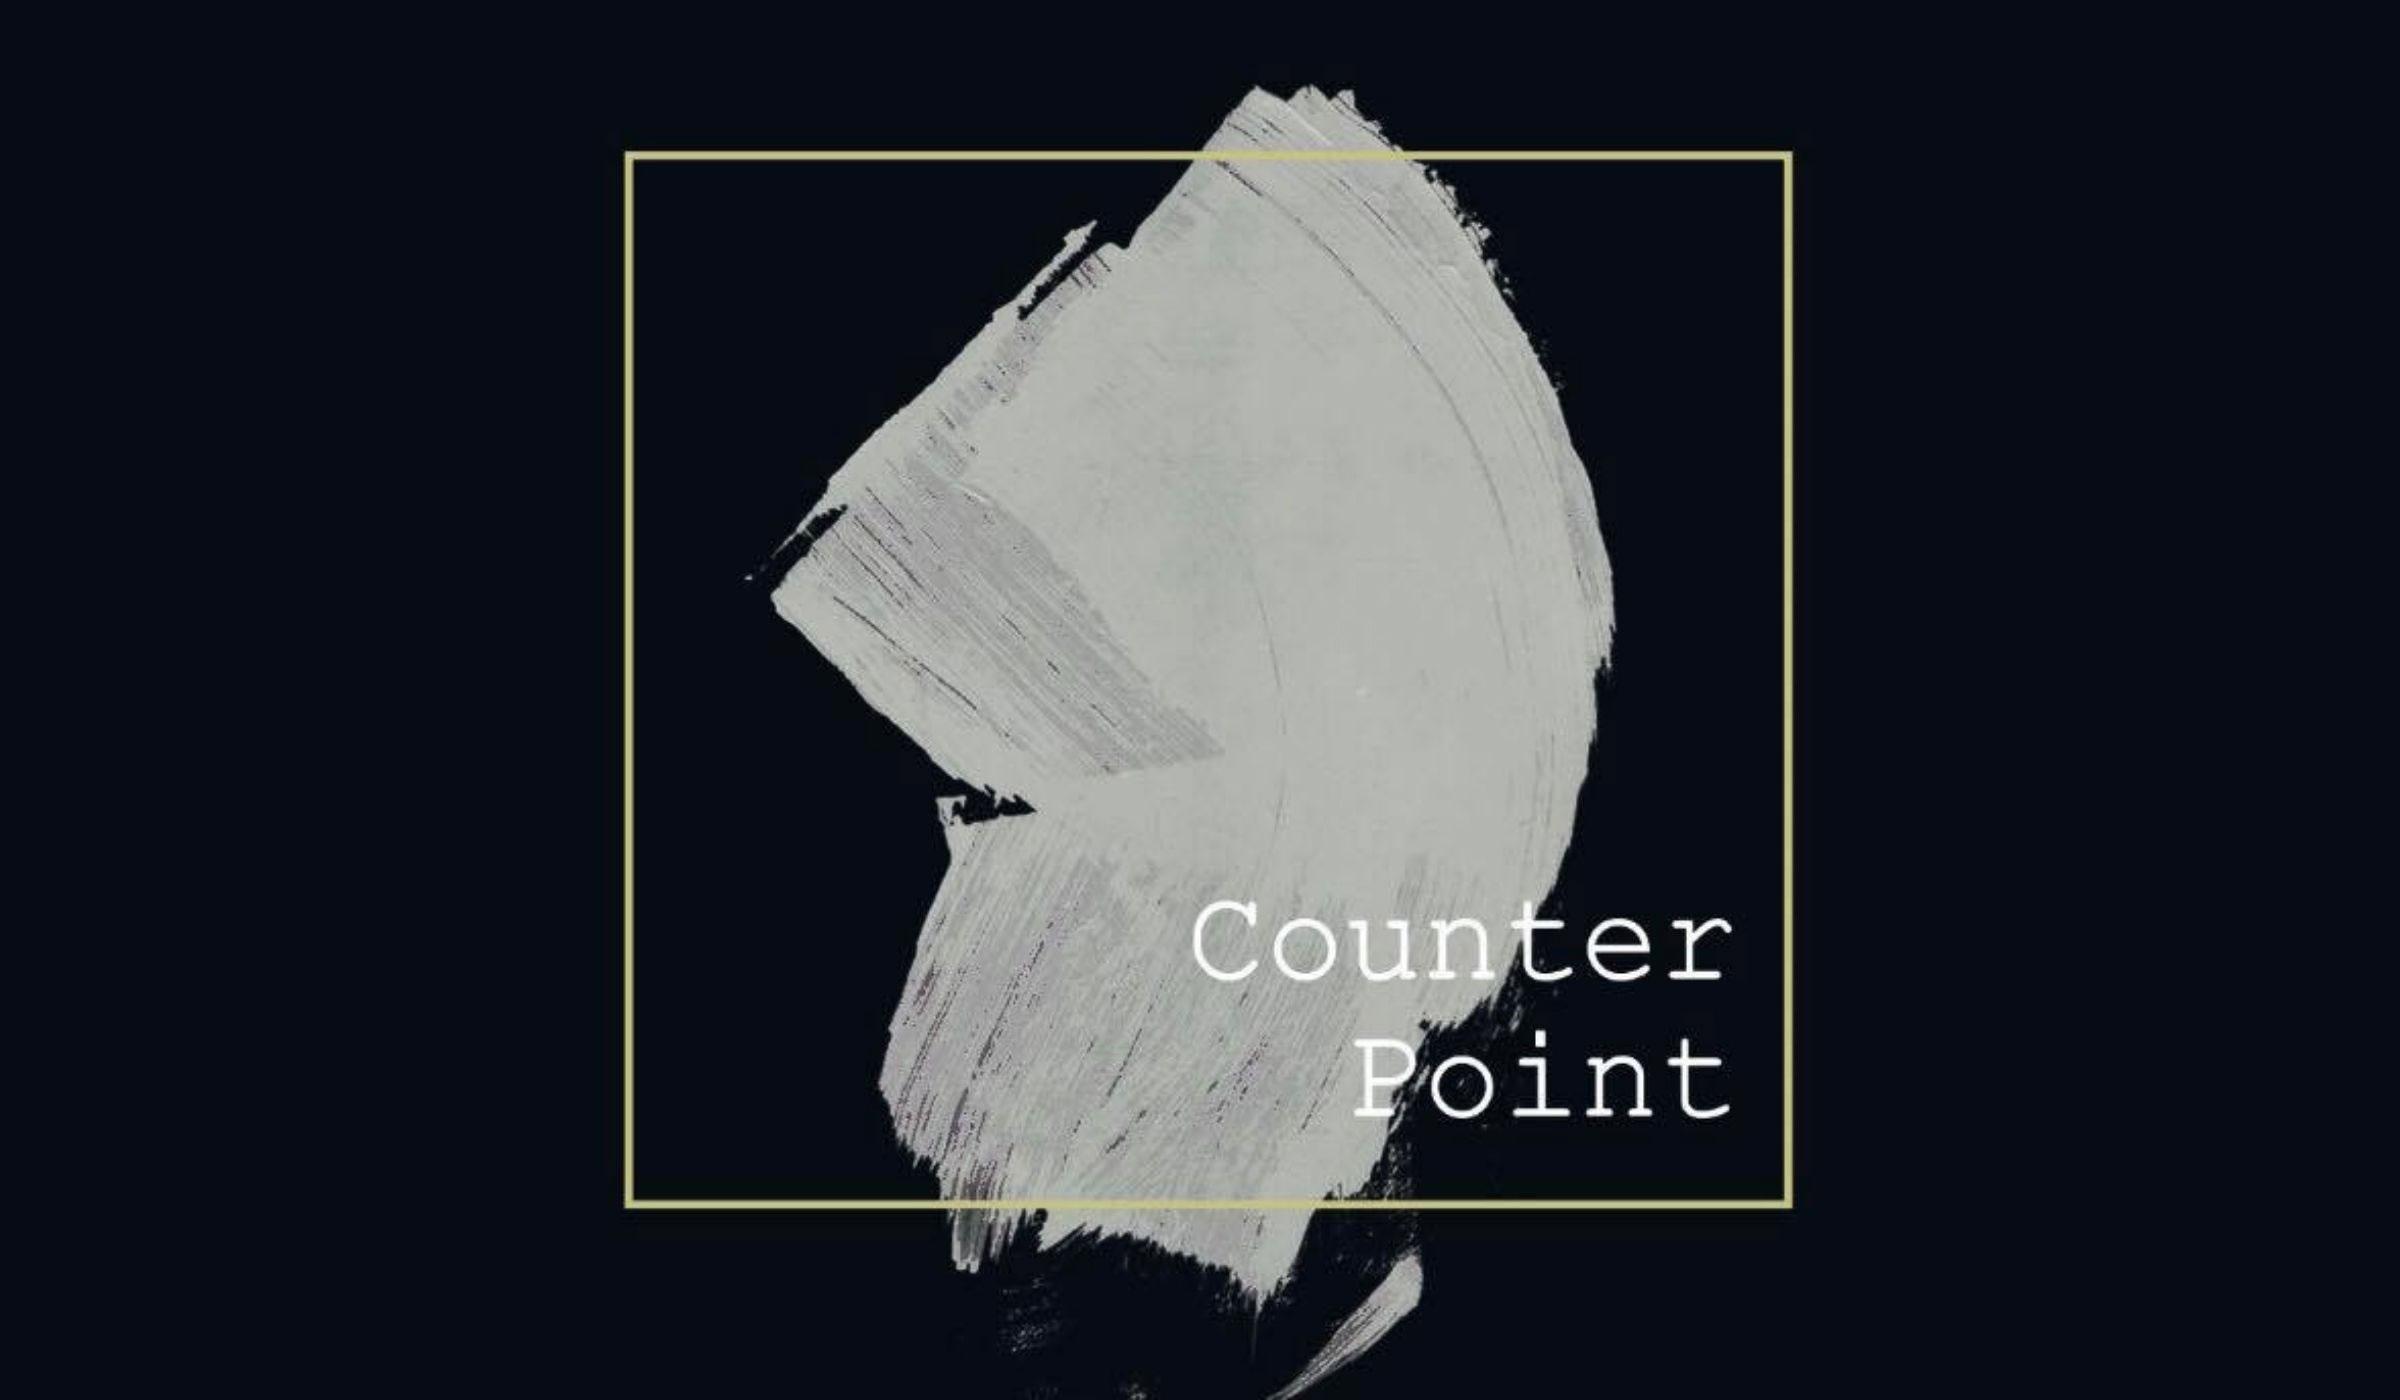 Counter Point logo